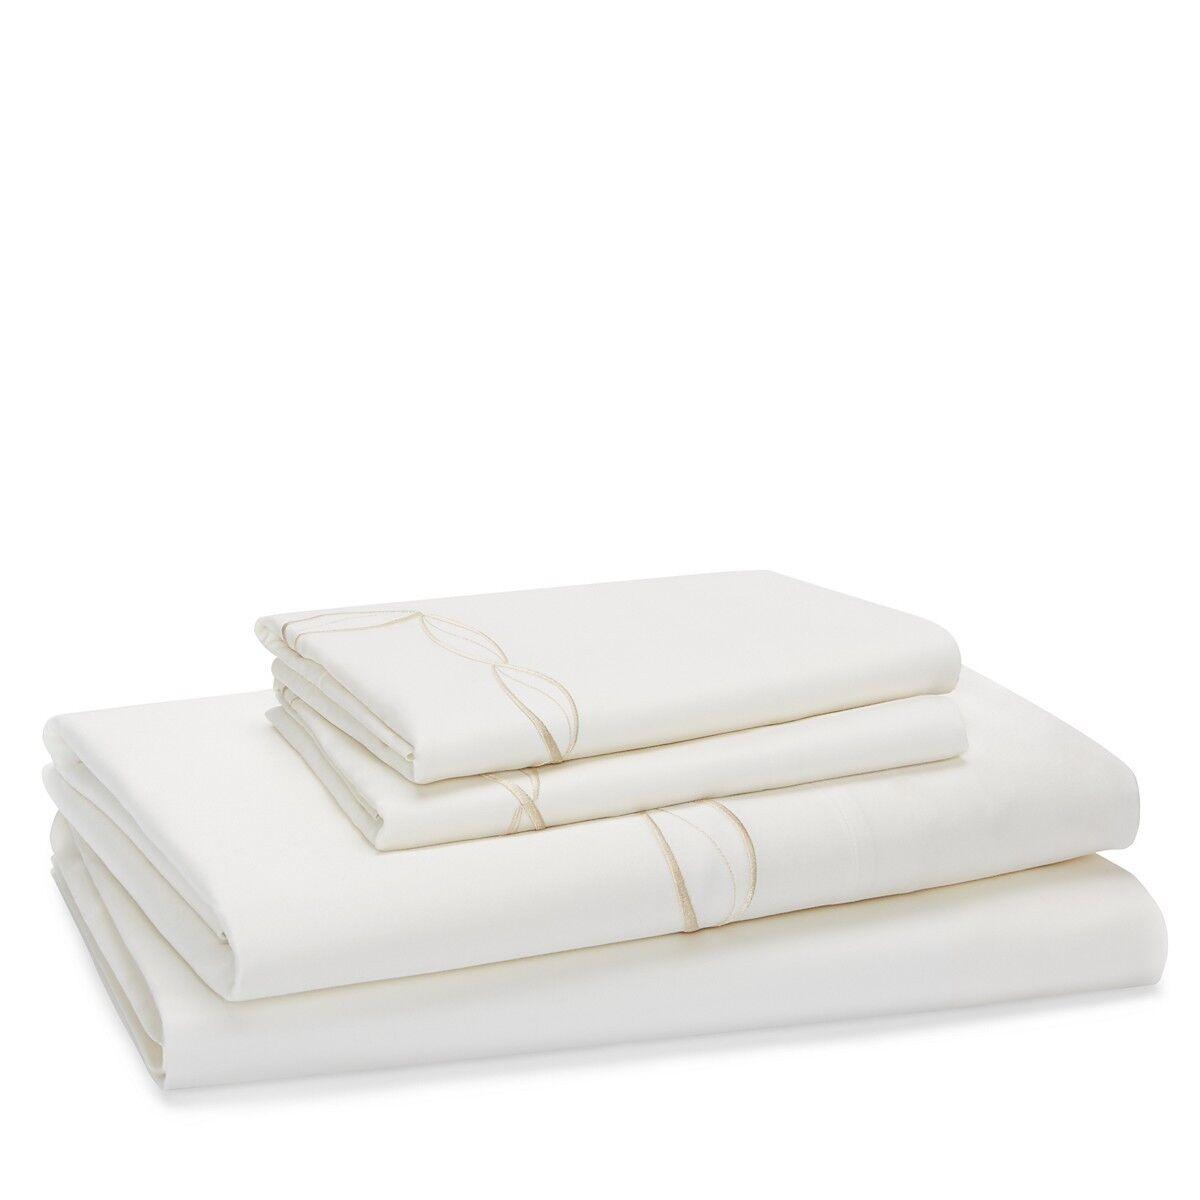 Frette Cardo Ricamo Embroiderot Cotton QUEEN Sheet Set Ivory   Gold A064